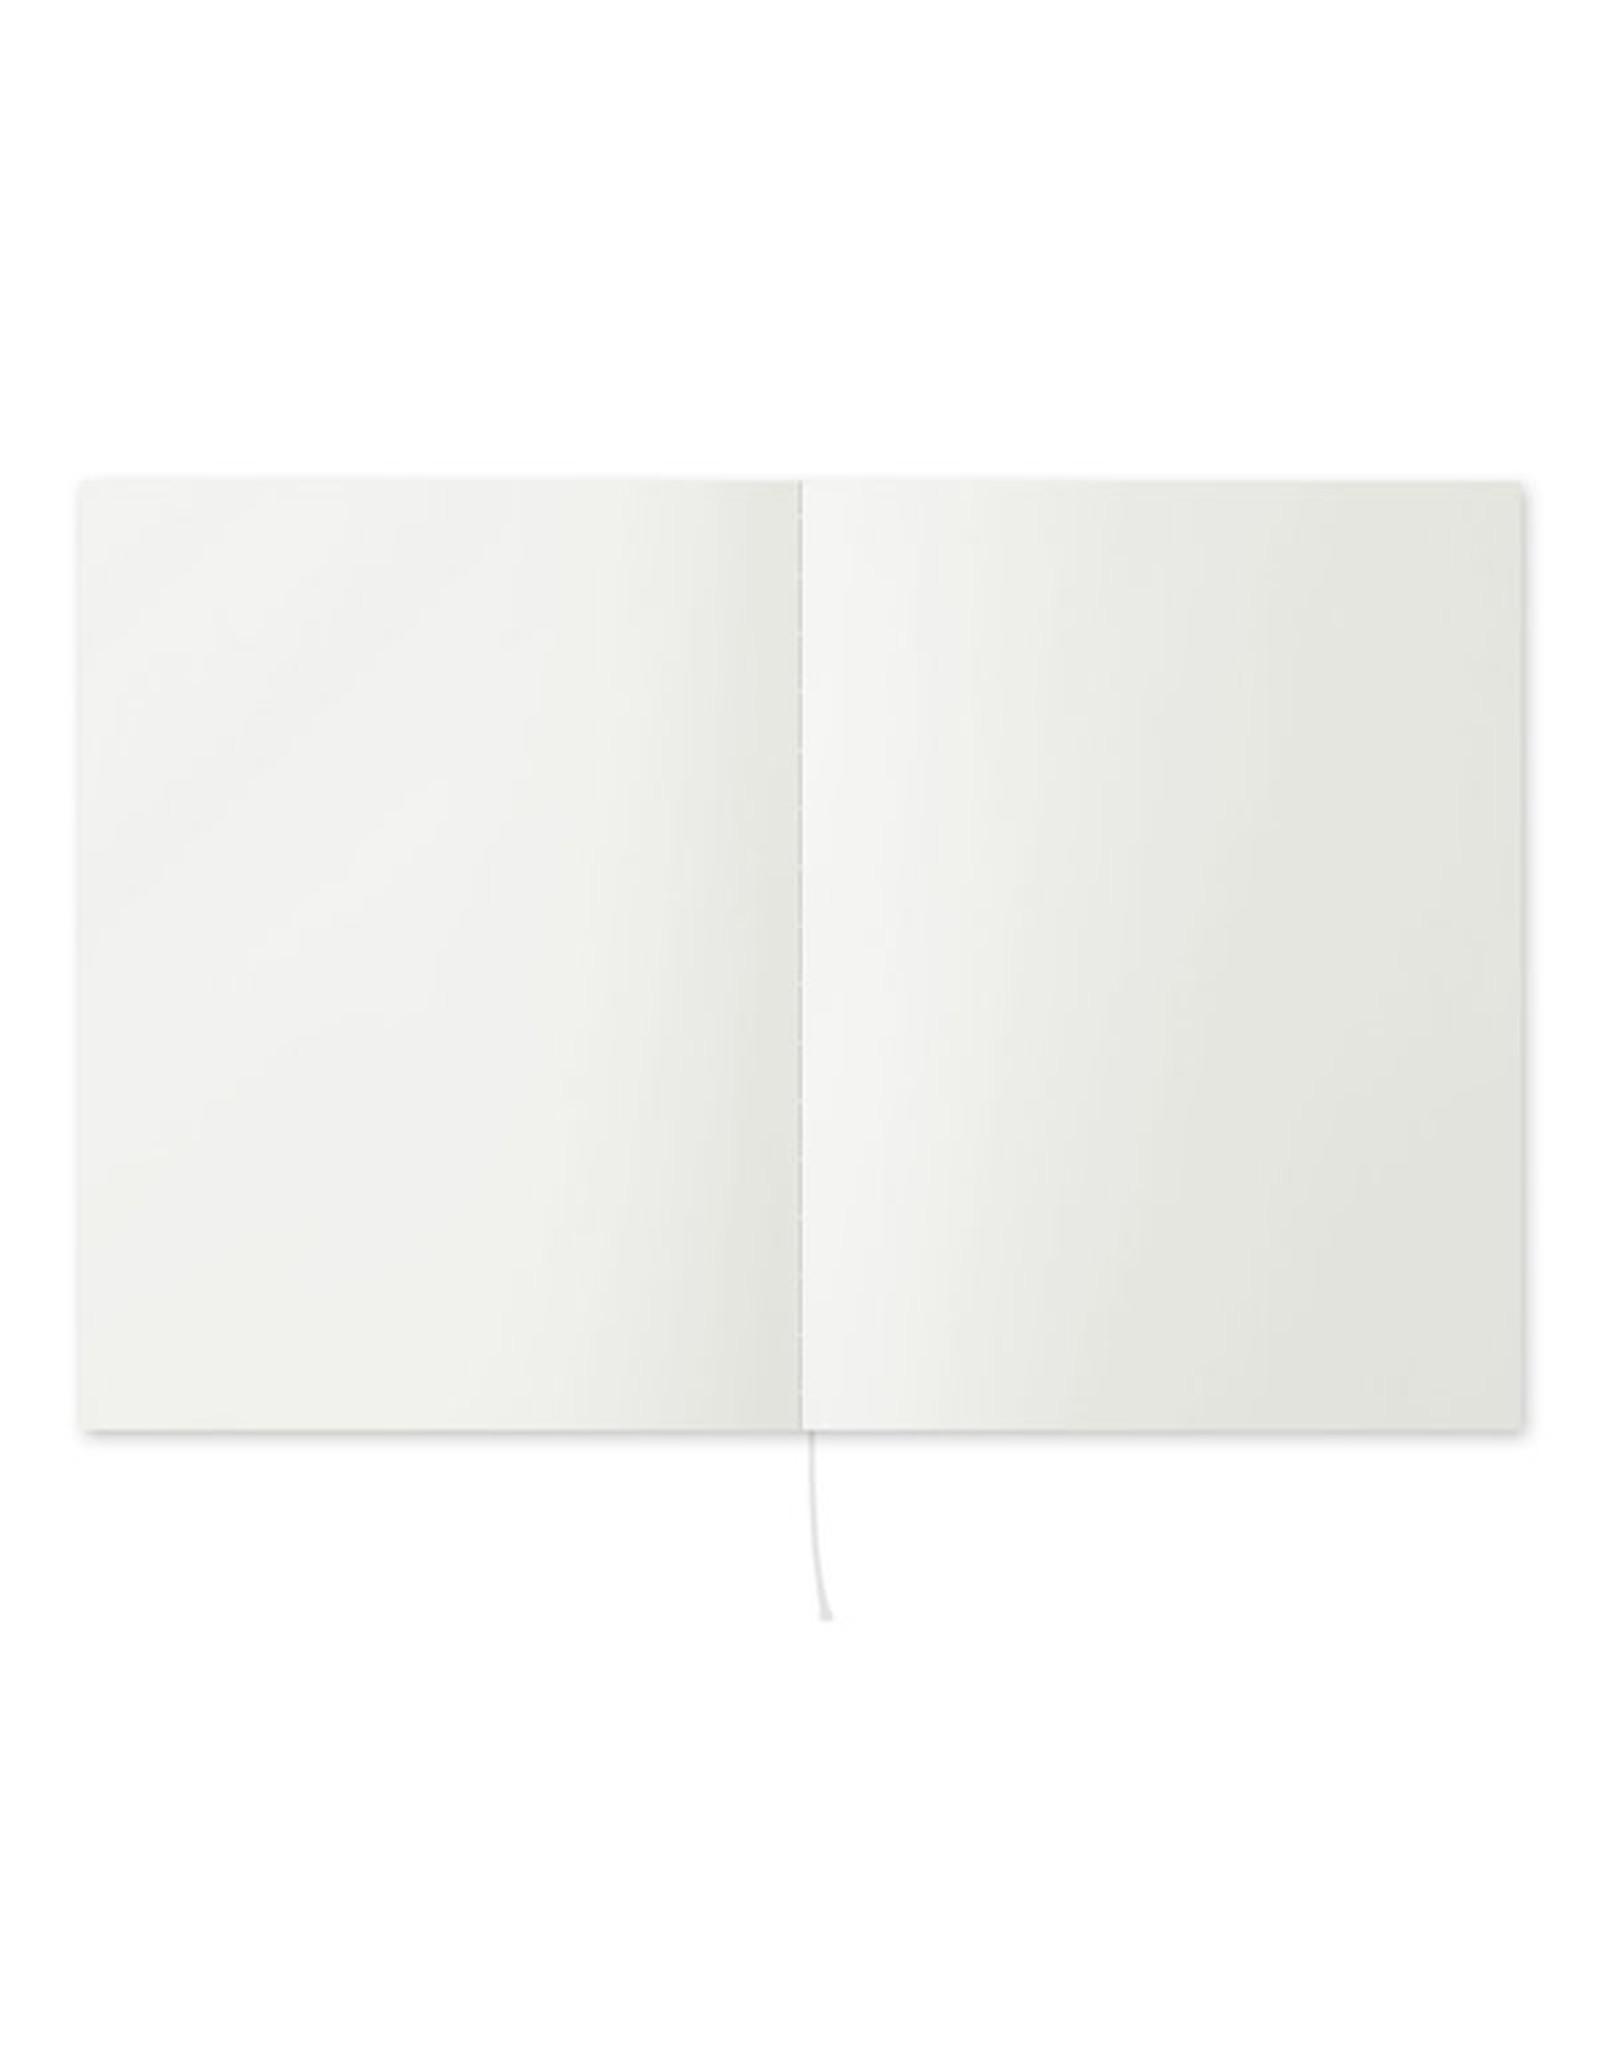 Designphil Inc. MD COTTON NOTEBOOK H275×W210×D10mm